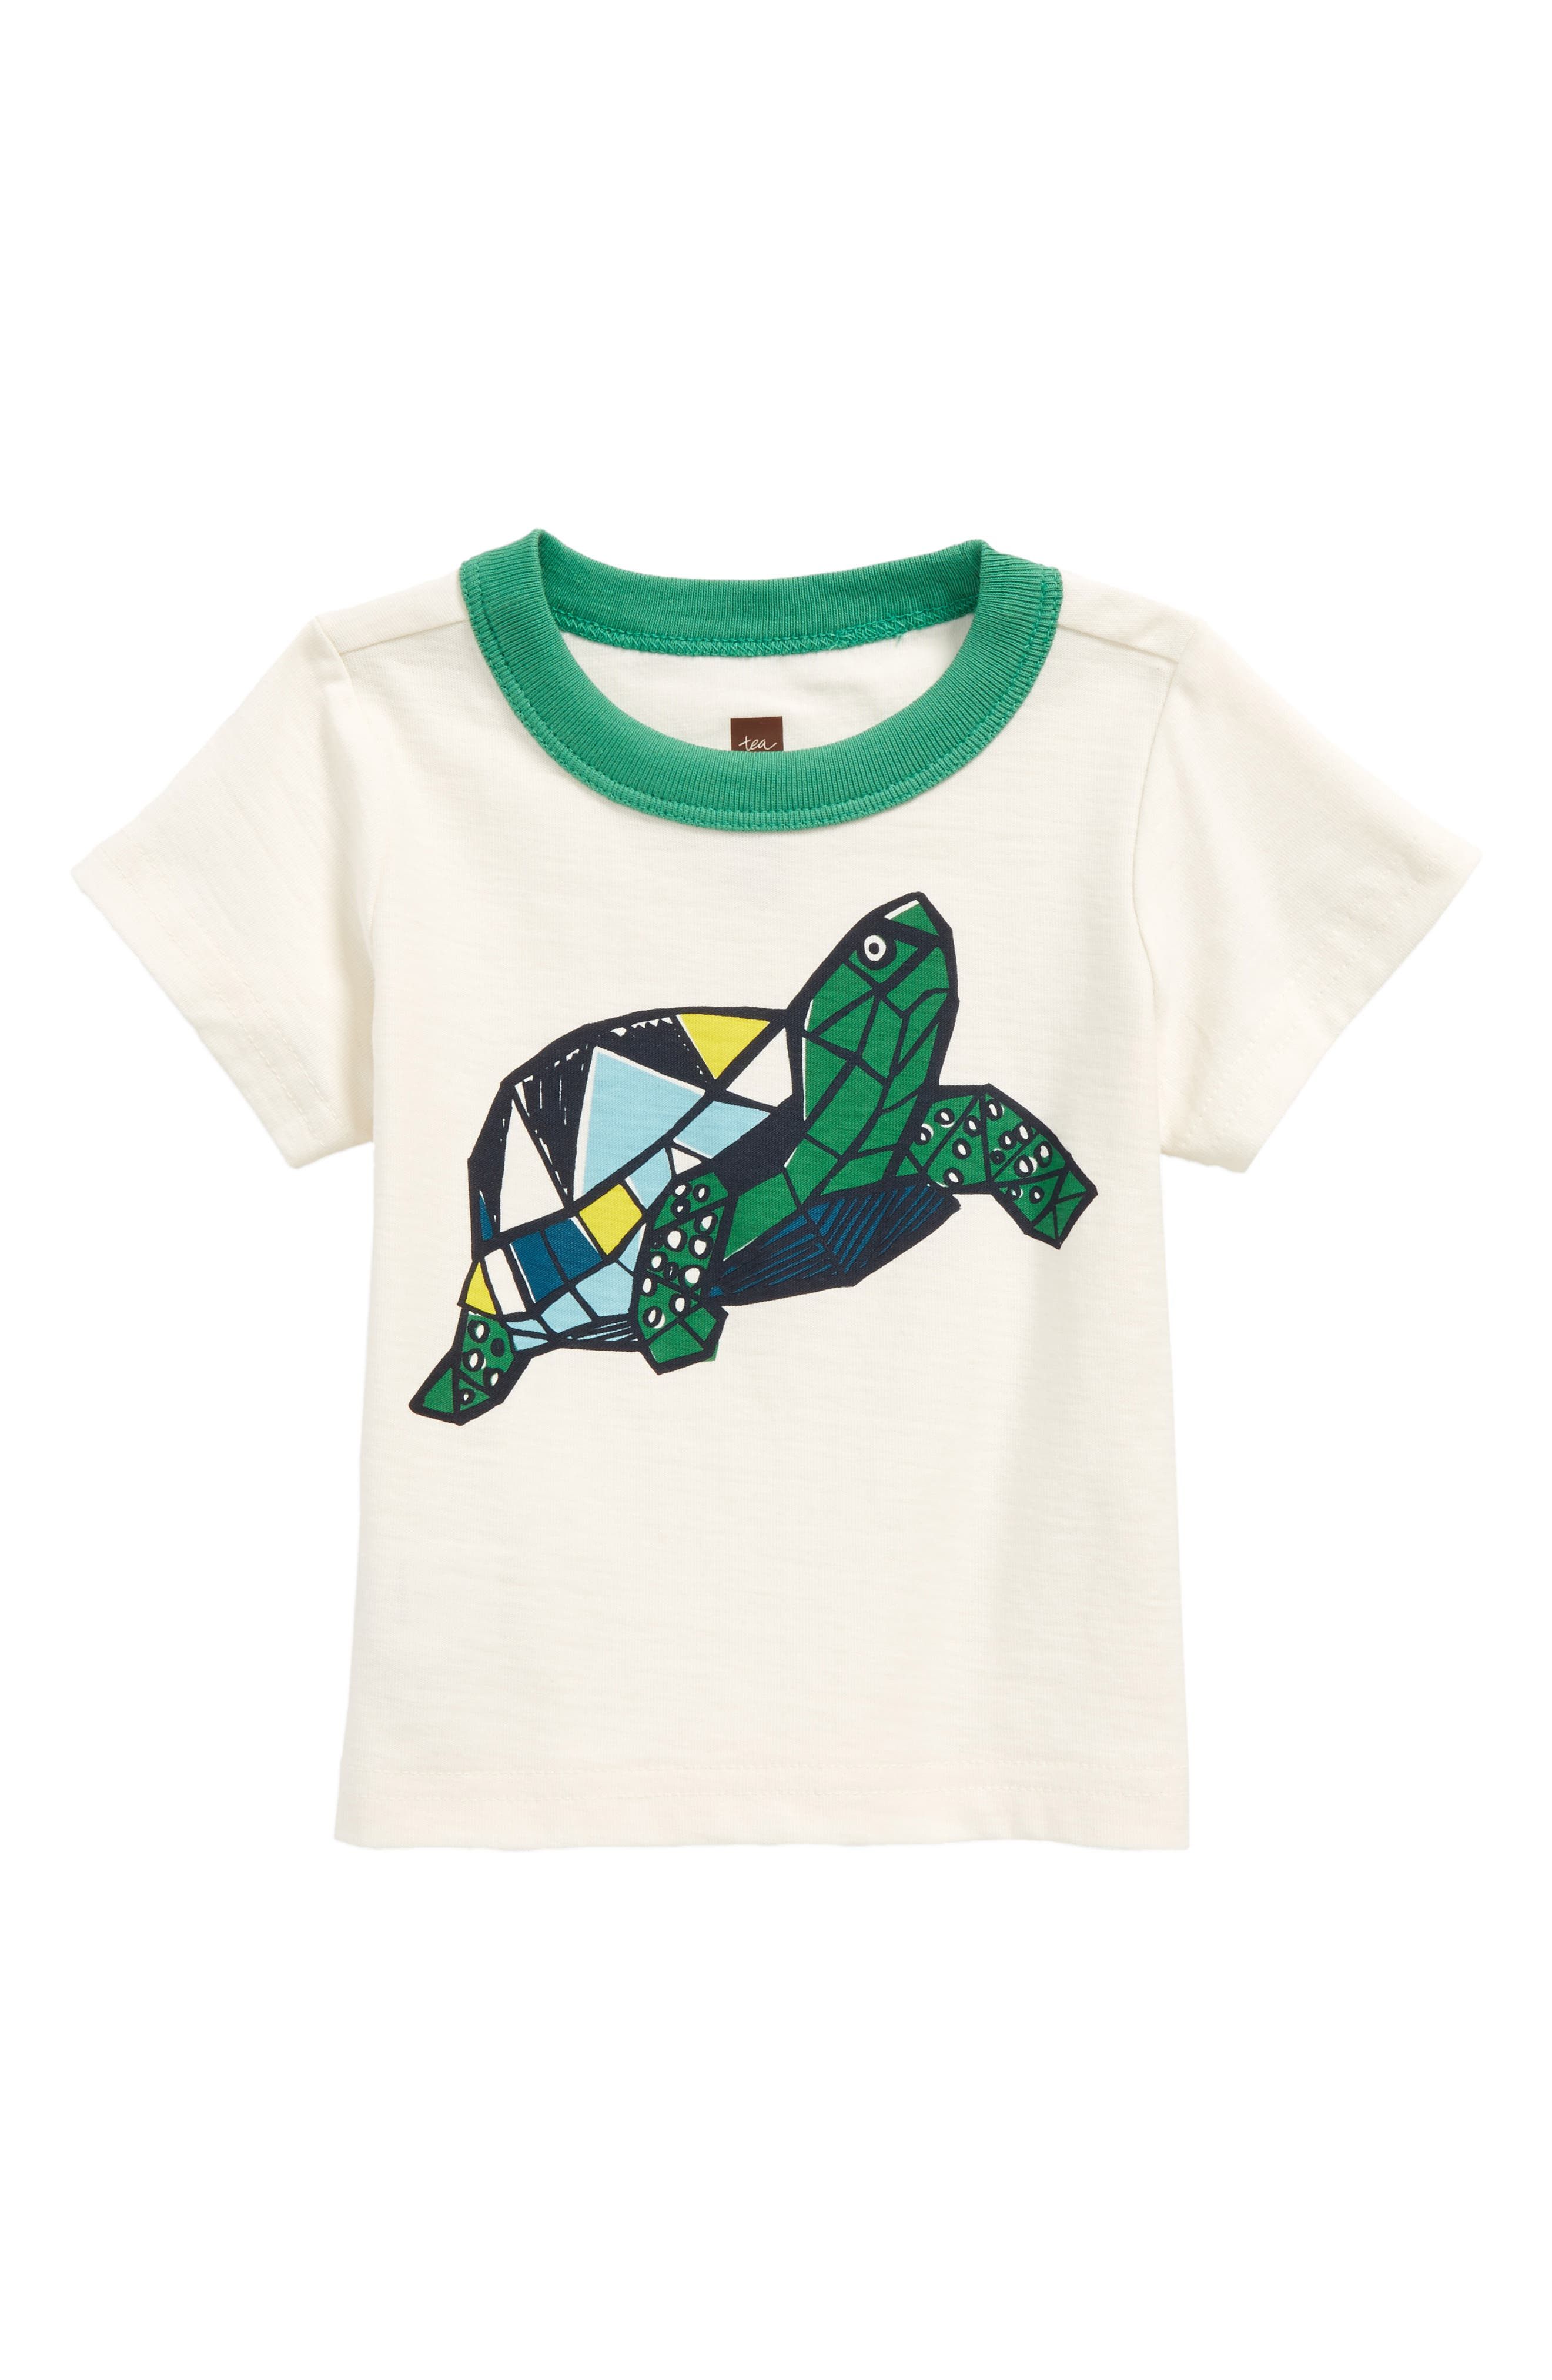 Turtle Power T-Shirt,                             Main thumbnail 1, color,                             Chalk